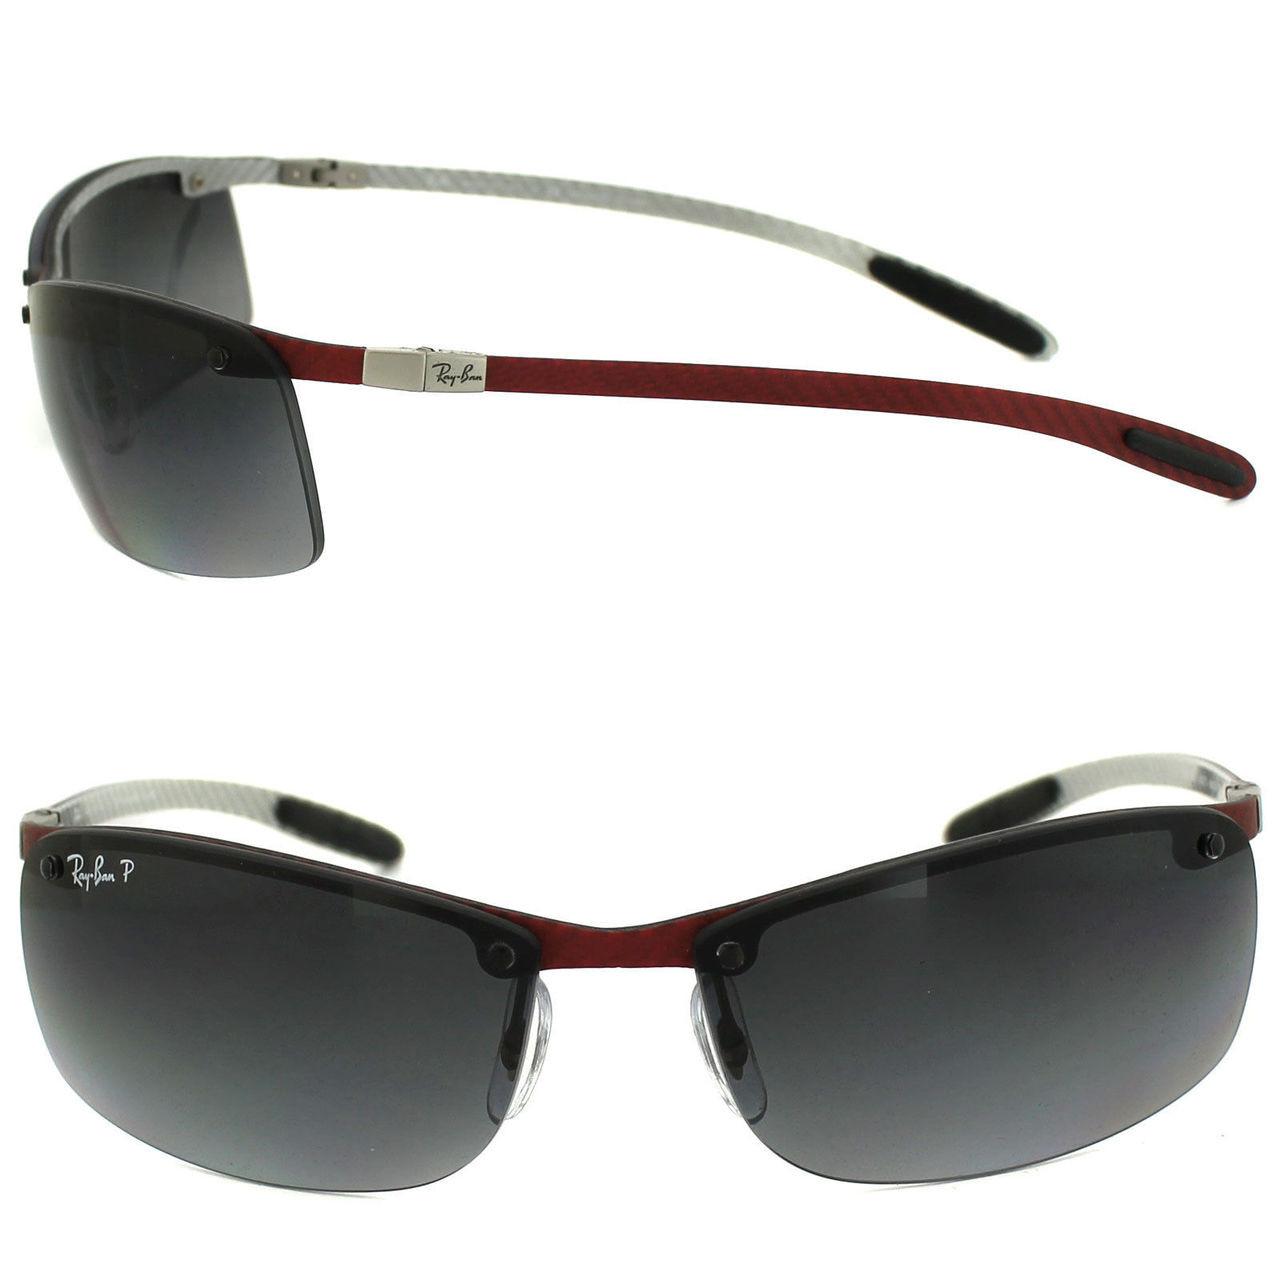 Ray-Ban Sunglasses ERIKA RB-4171 622/T3